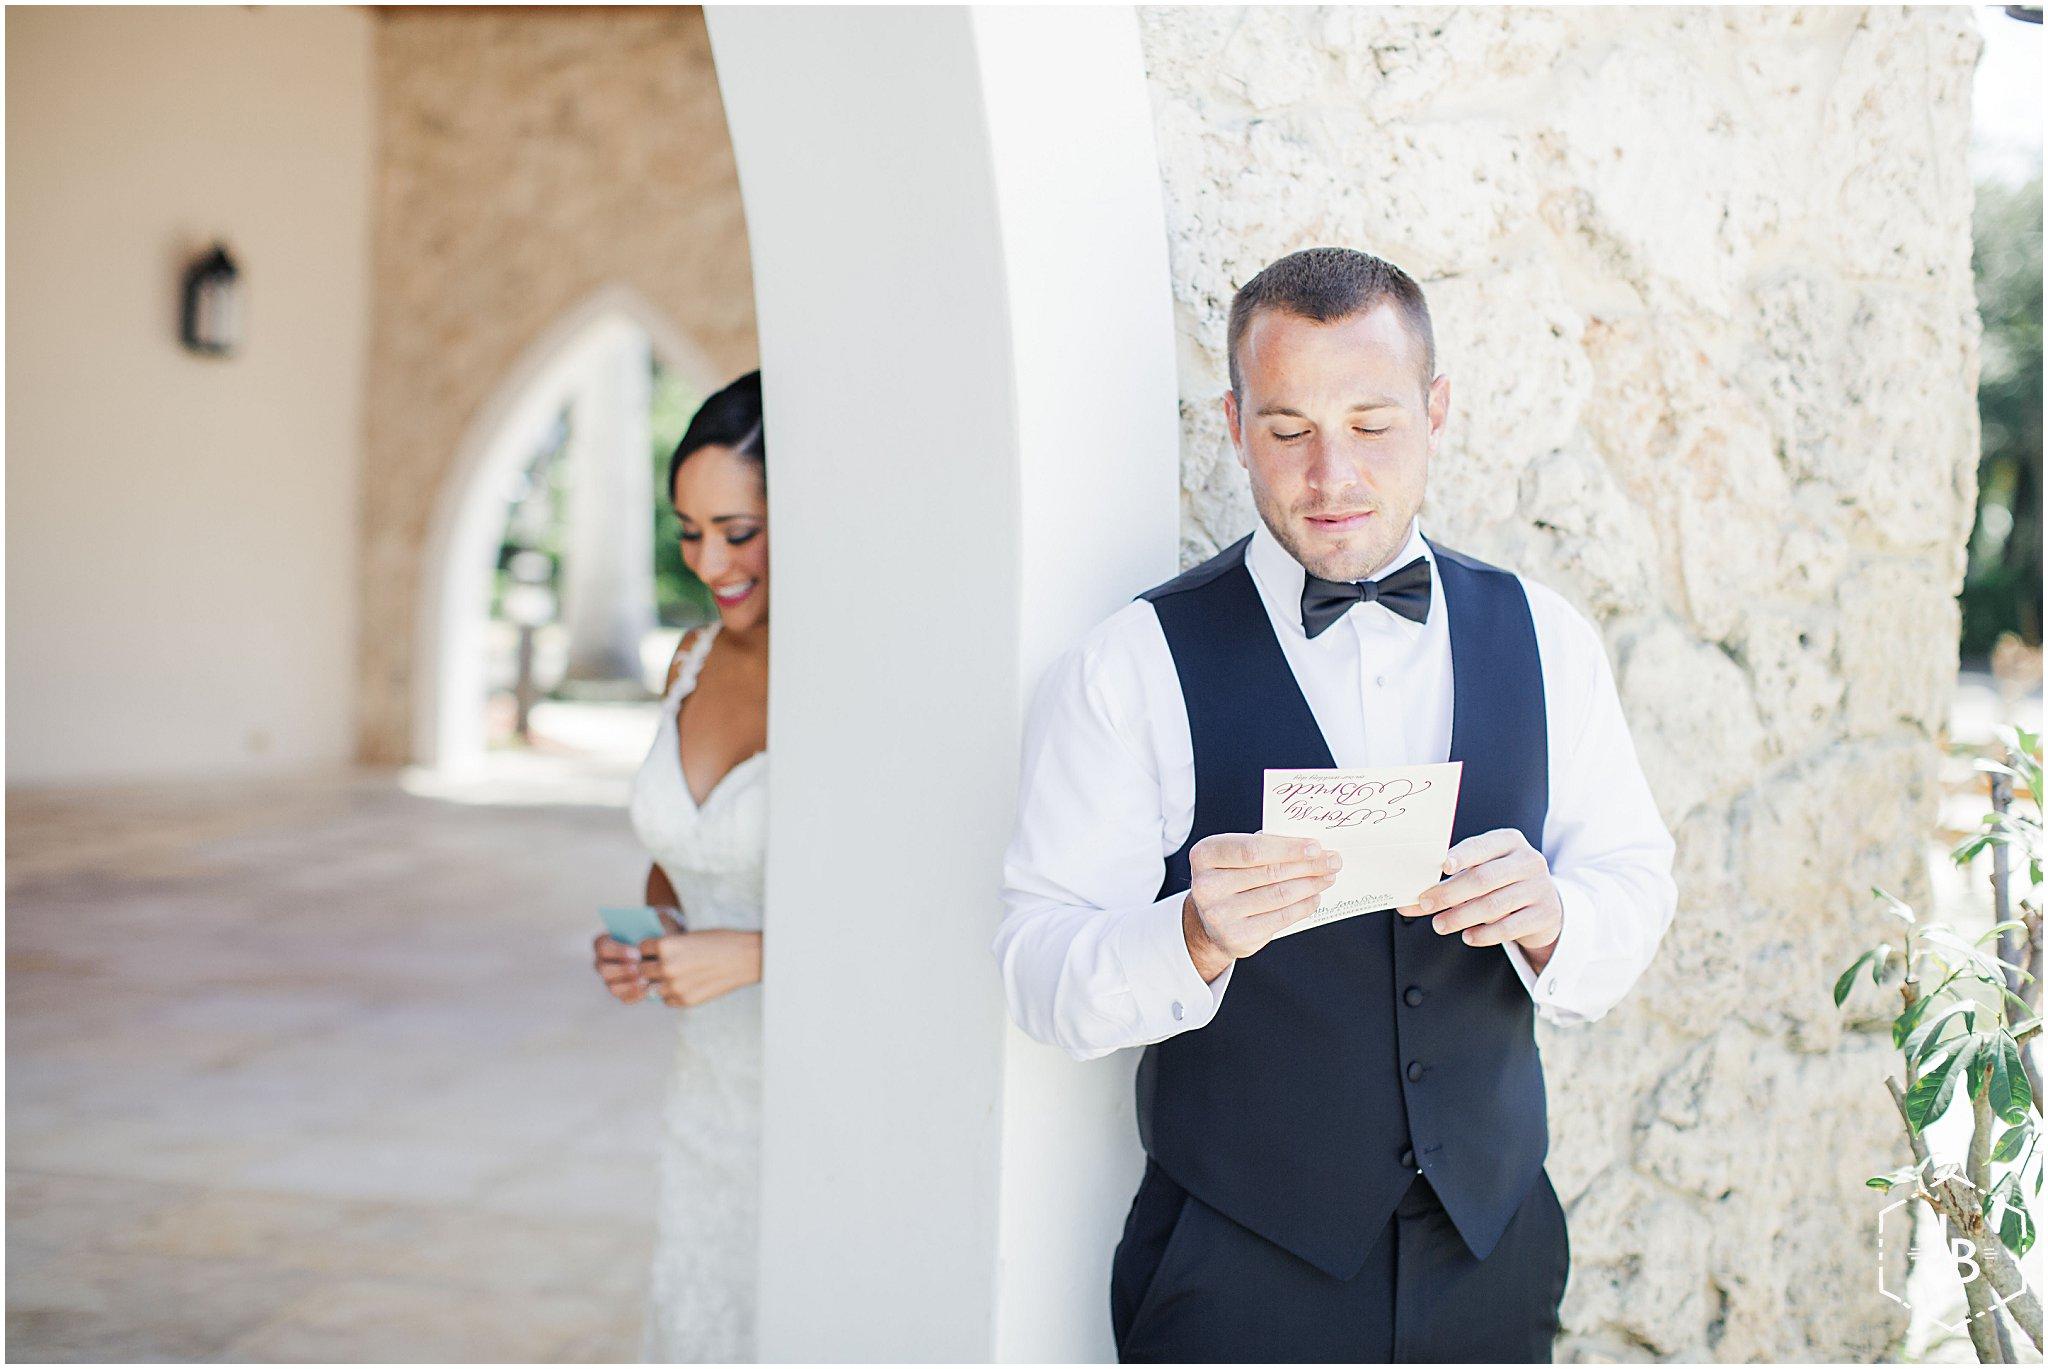 WeddingandEngagementFloridaPhotographer_0200.jpg